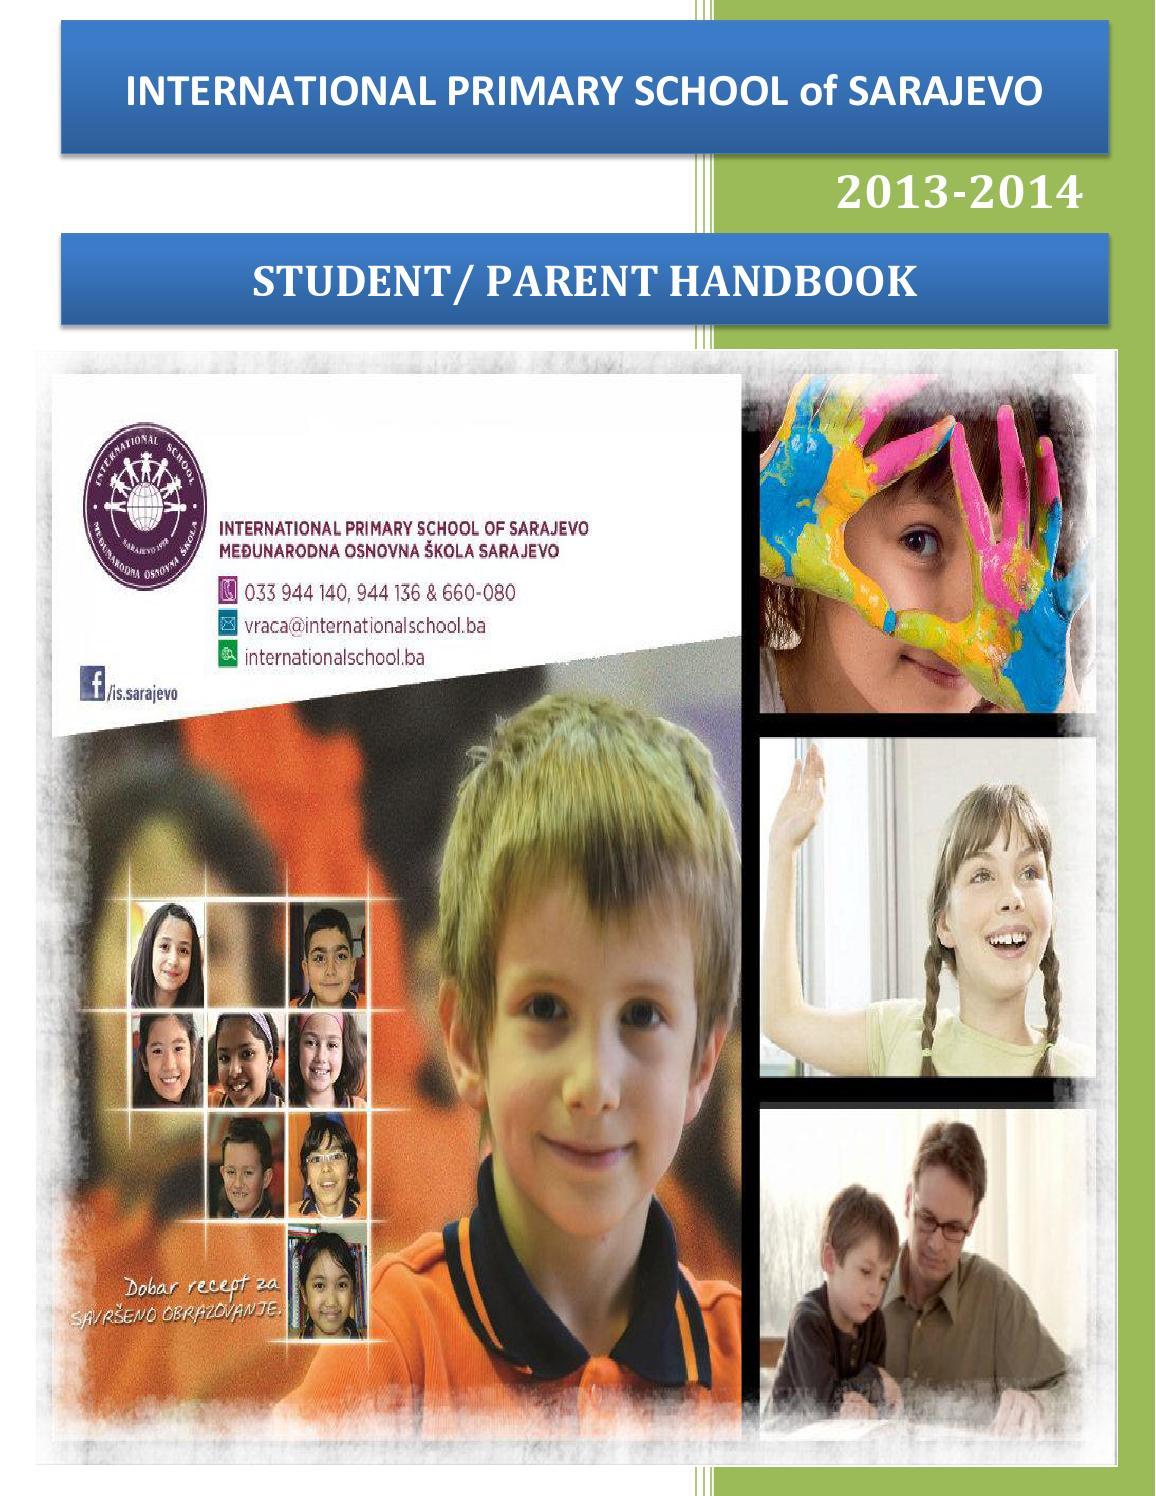 ipss parents handbook by bosna sema primary schools issuu